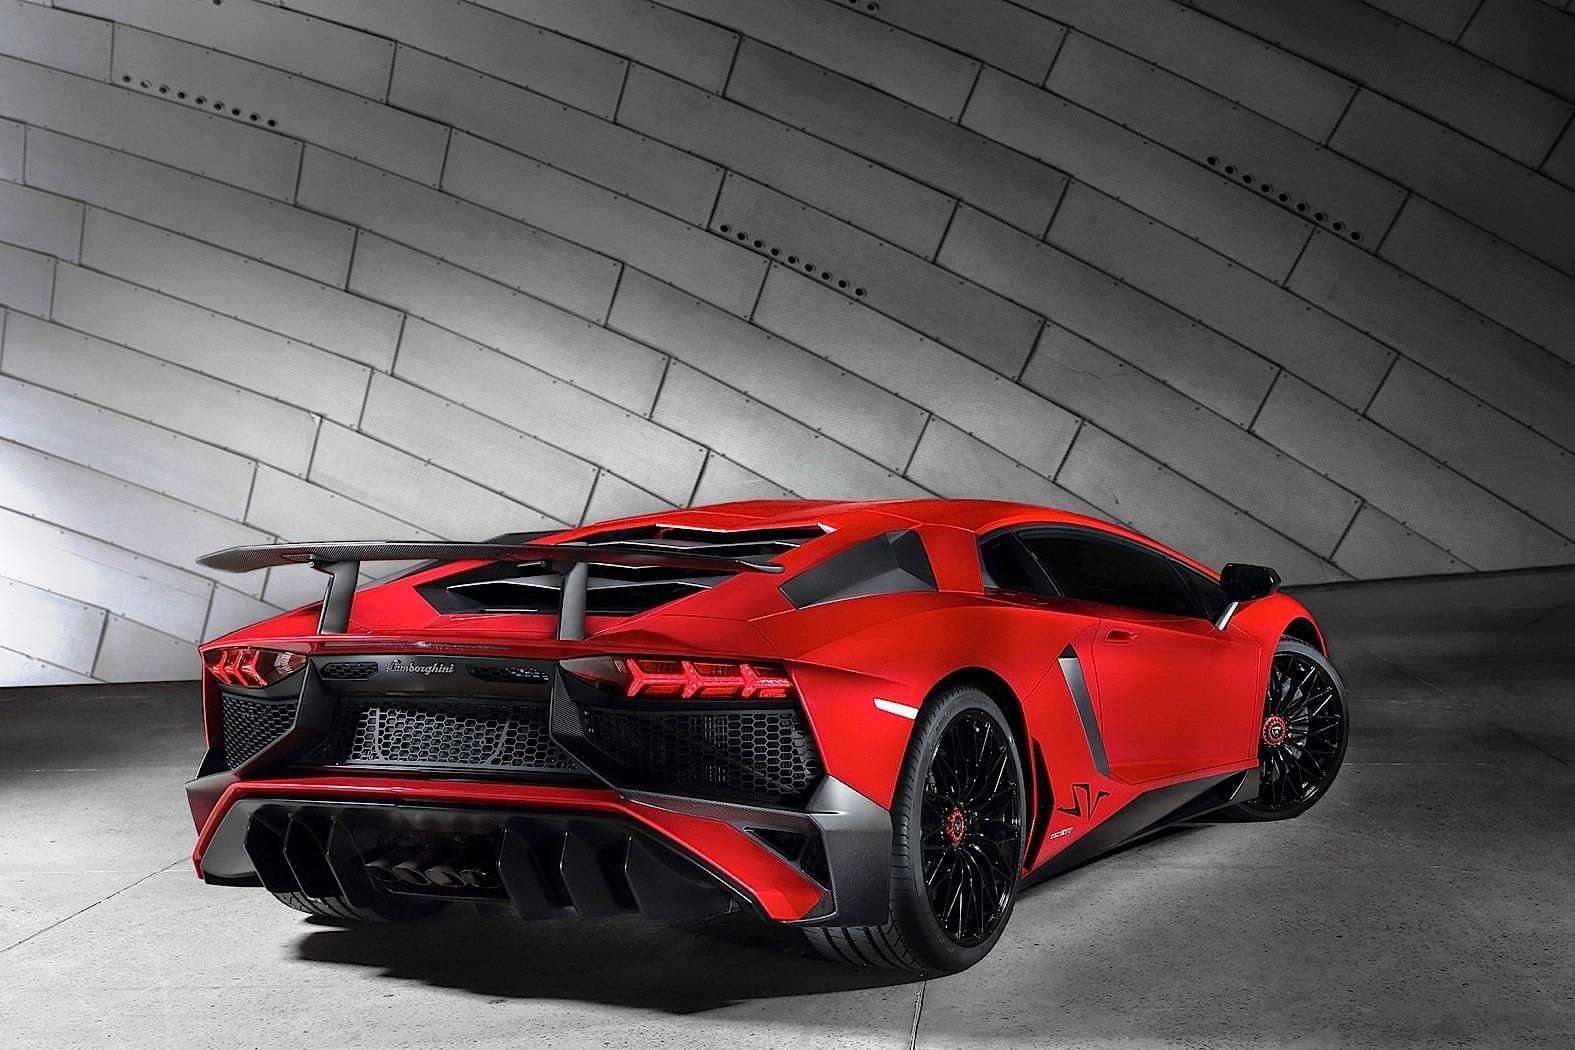 2017 Lamborghini Aventador LP 750-4 Superveloce Review ...